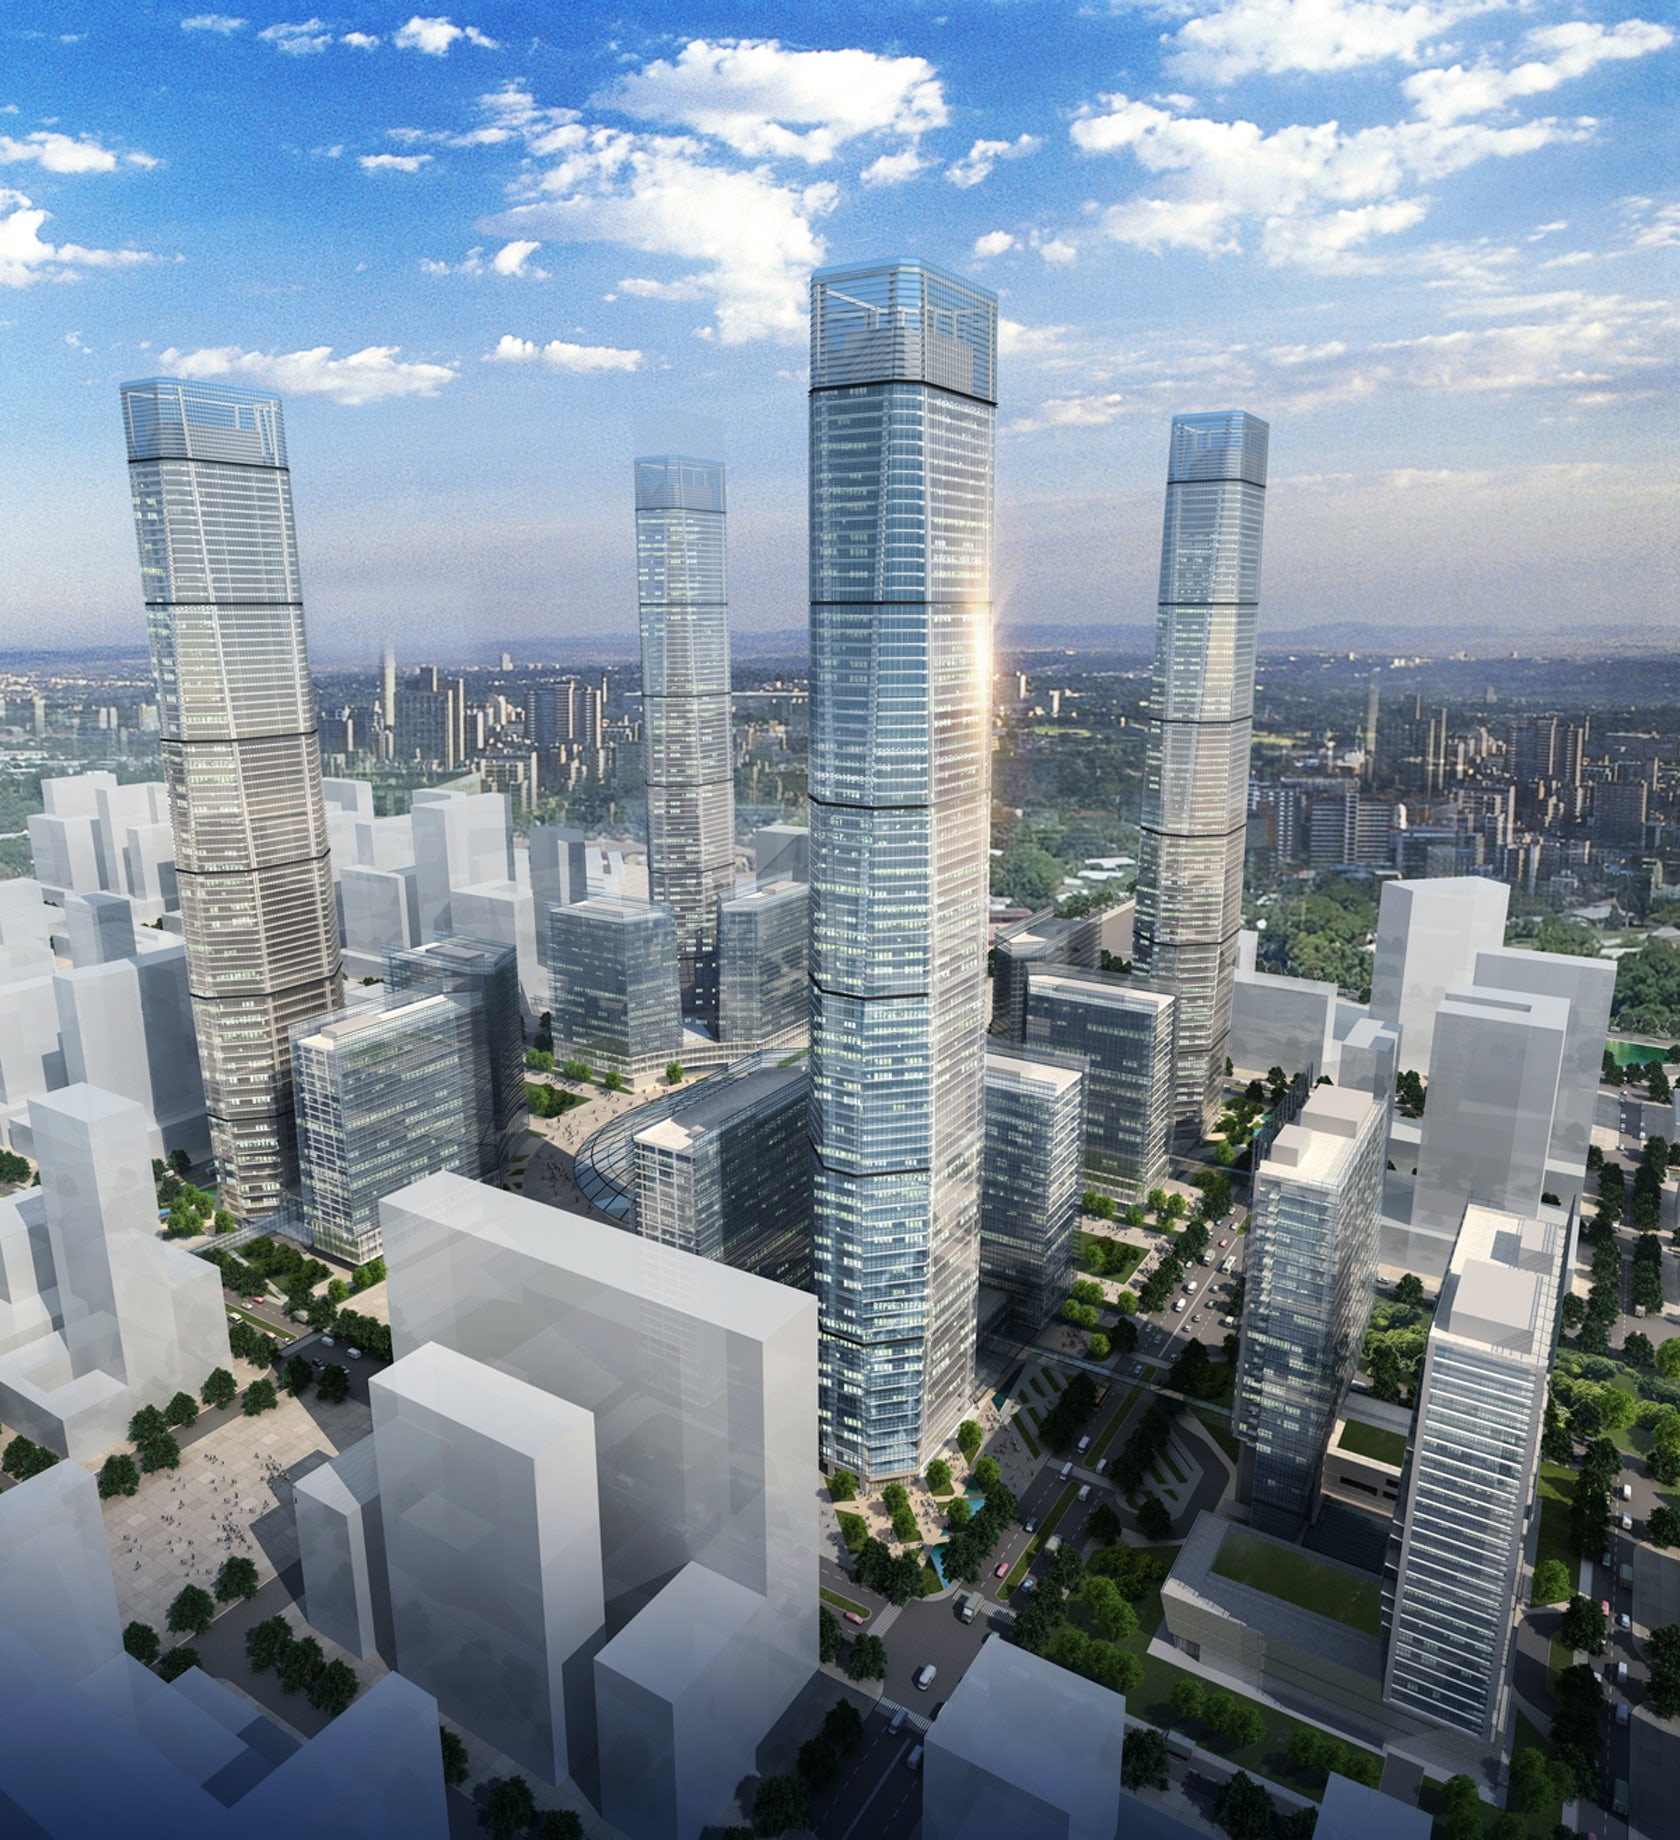 Citycenter: Changchun Southern New City Center